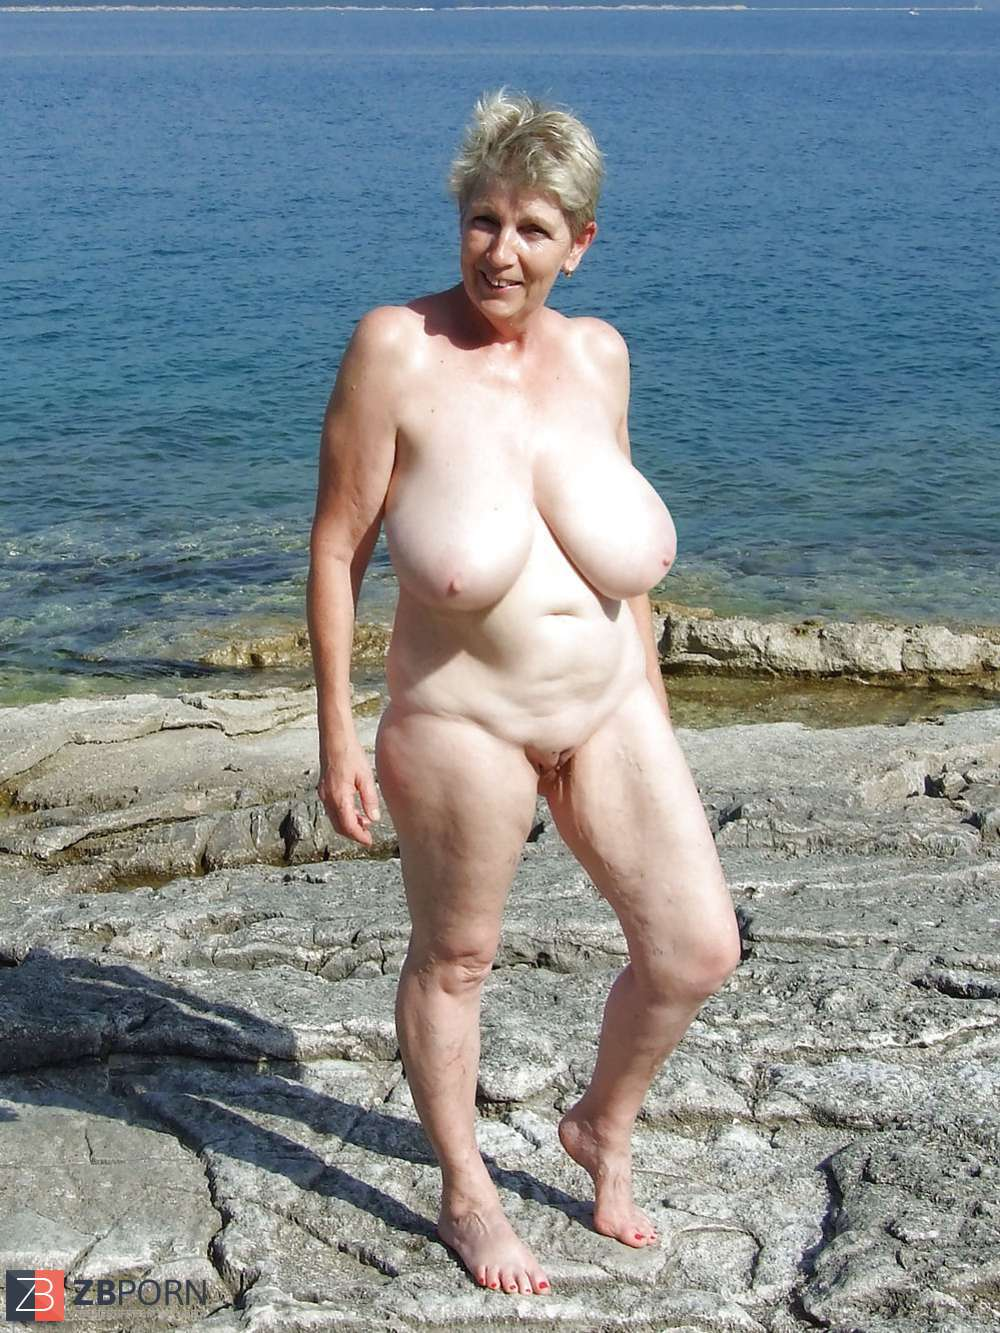 Naturist Granny Mega-Bitch  Zb Porn-9809